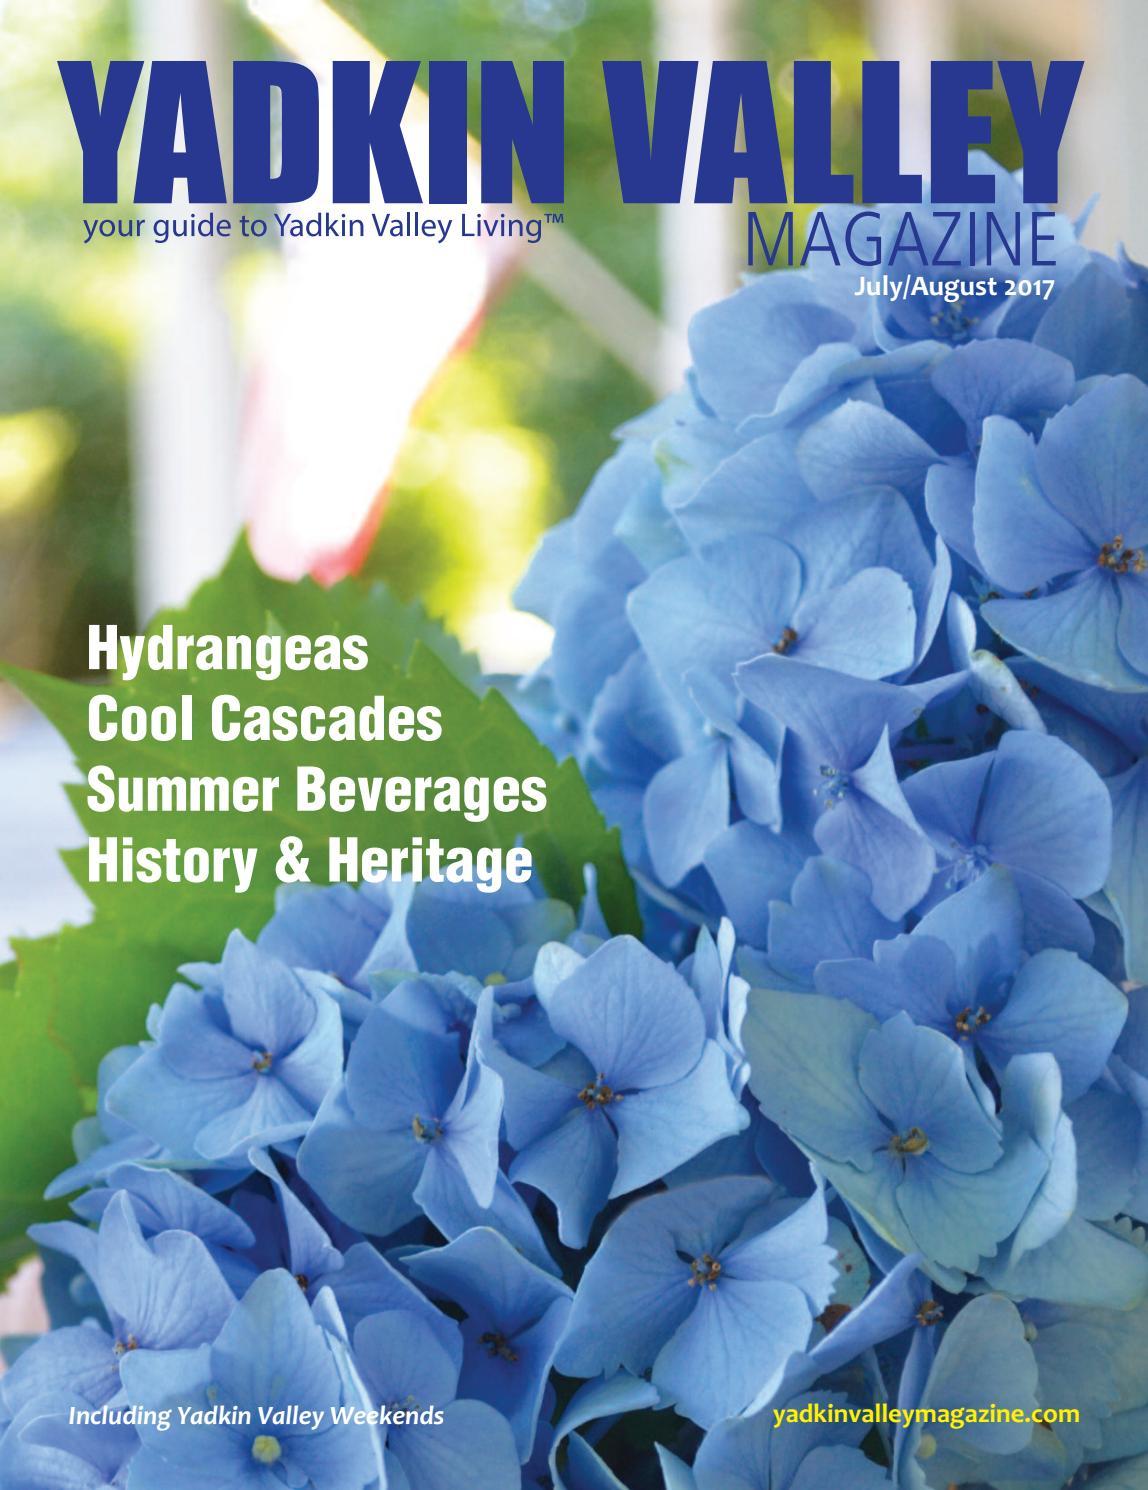 Yadkin Valley Magazine July August 2017 By Yadkin Valley Magazine